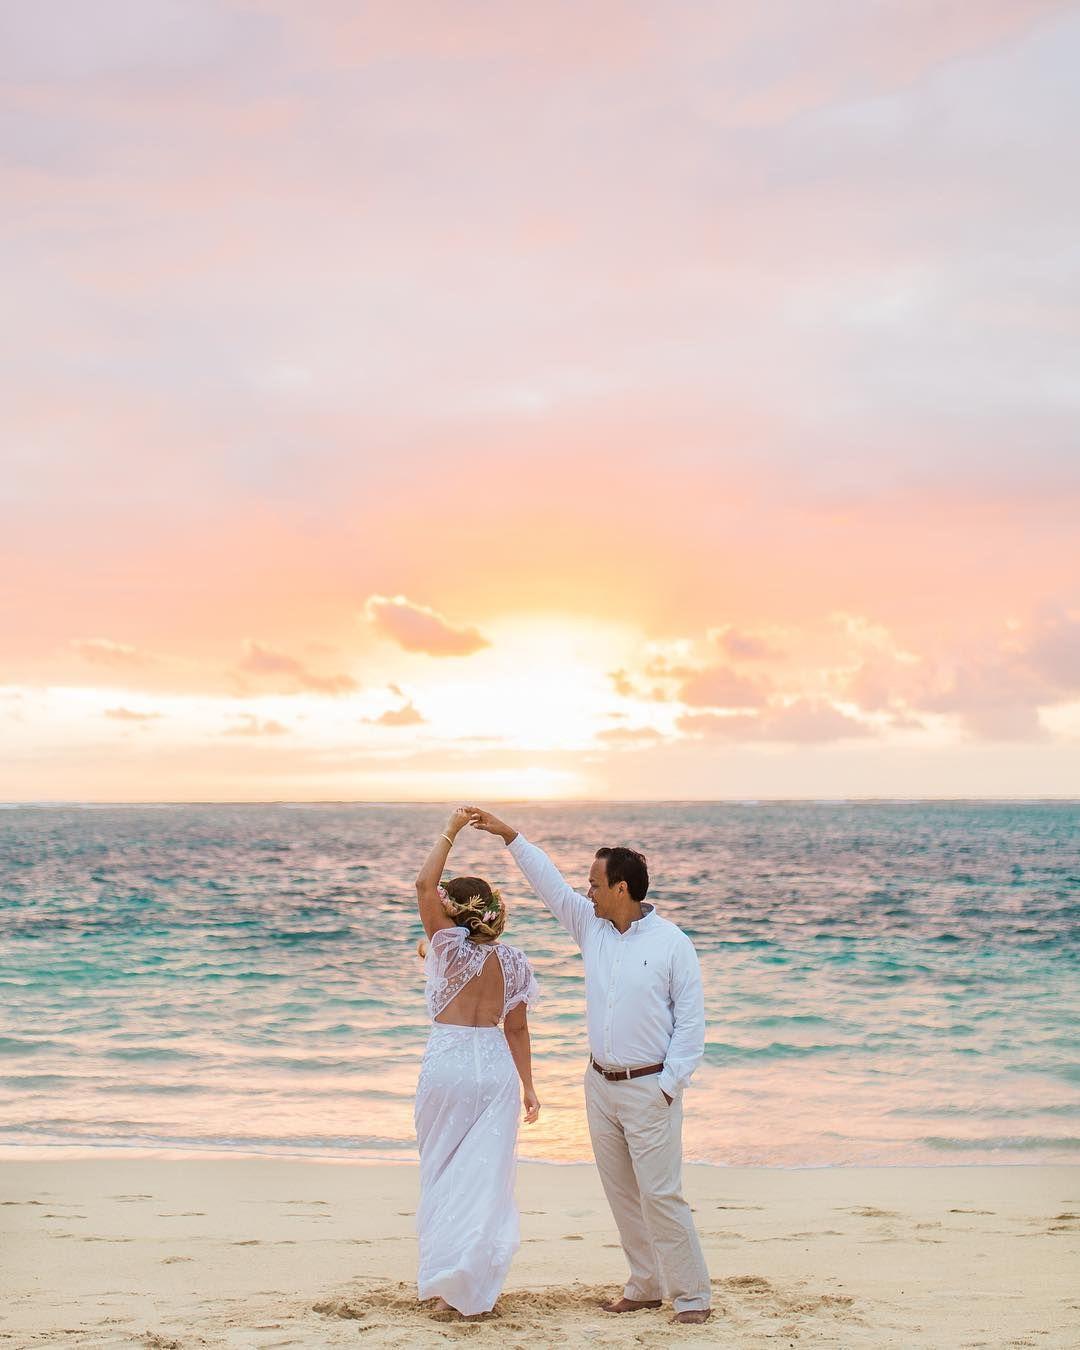 Sunrise beach wedding  Vanessa Hicks on Instagram ucItus never ucfunud getting up at  for